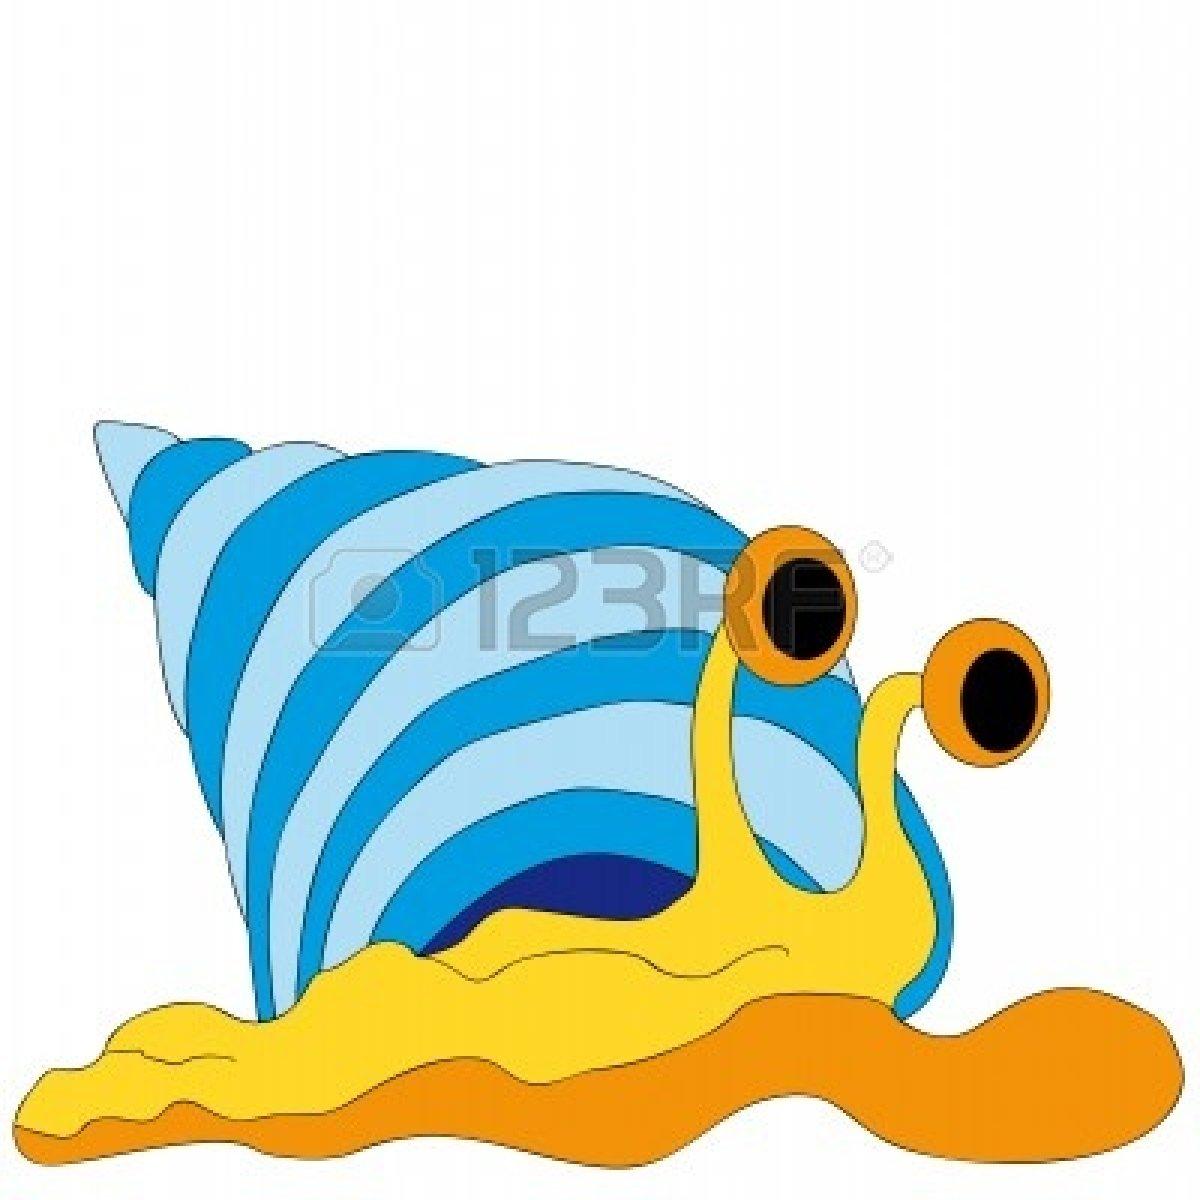 1200x1200 Oyster Shell Sea Snail Clipart Panda